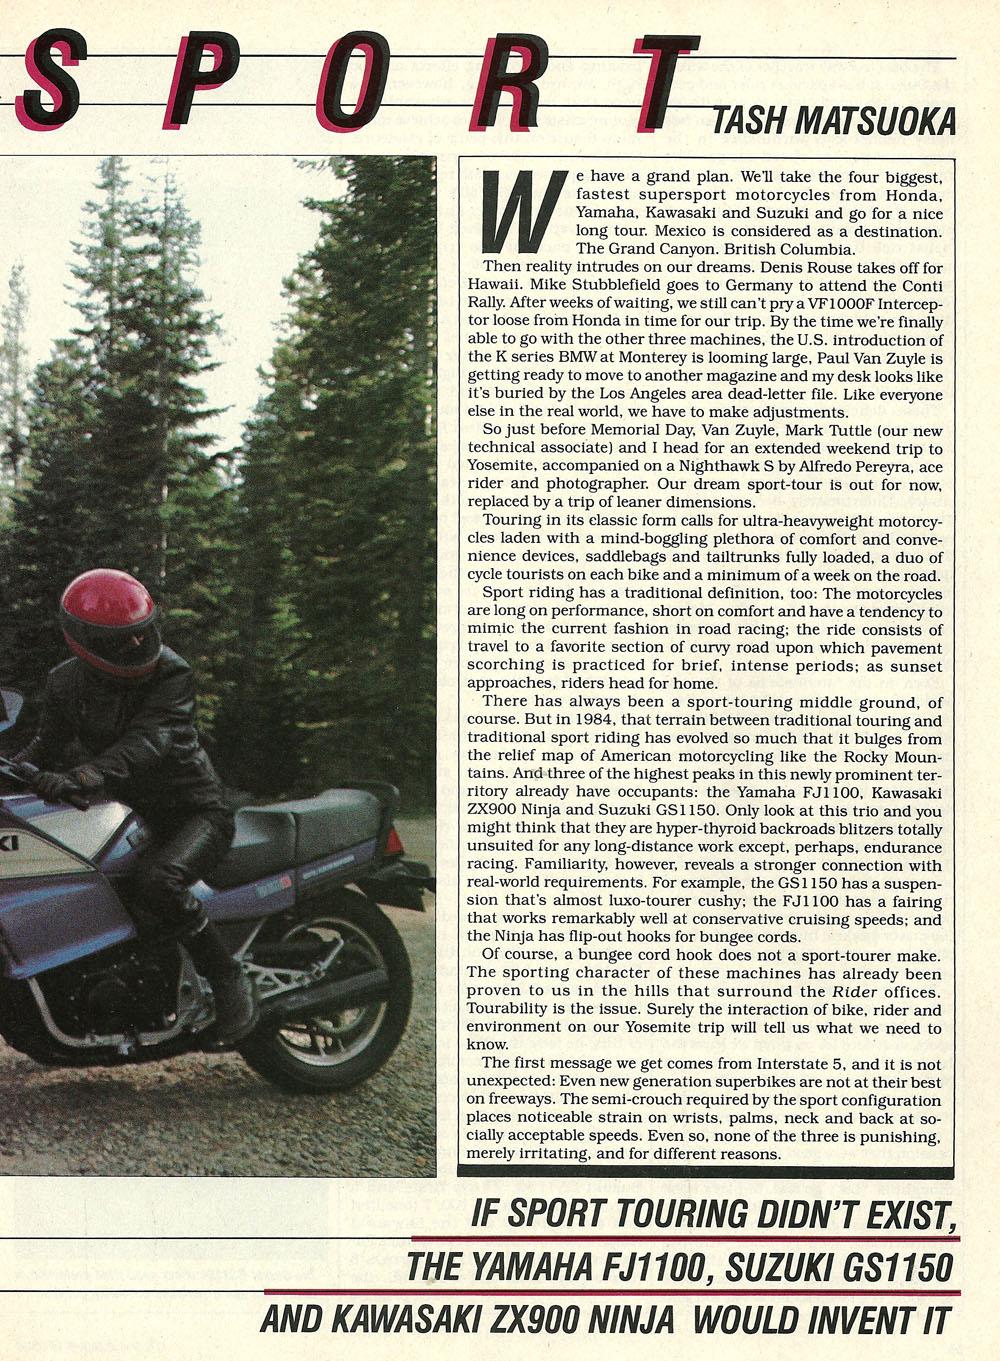 1984 fj1100 zx900 gs1150 road test 02.jpg